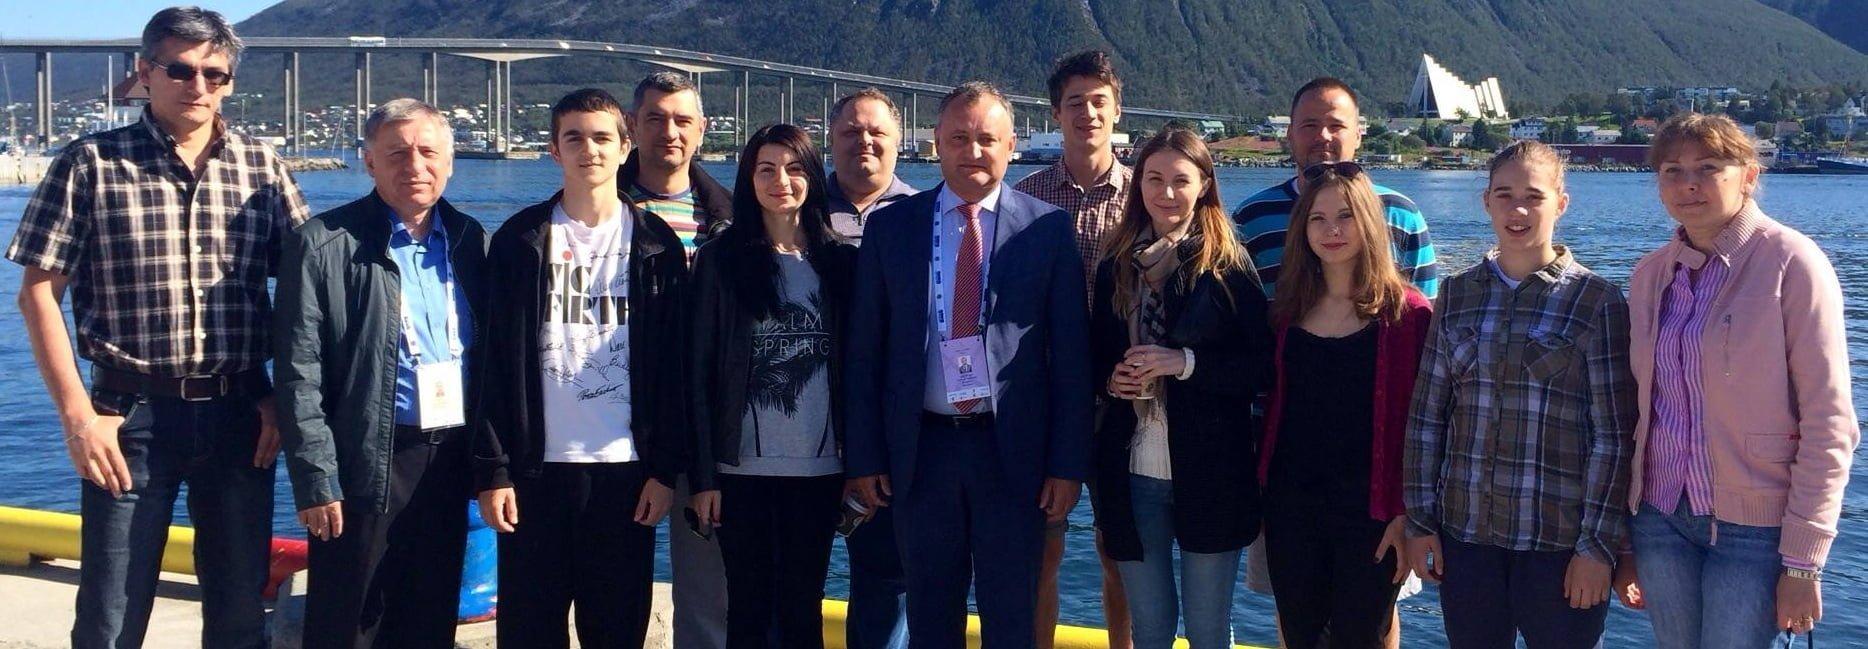 Olimpiada Mondială la Șah 2014 — Tromso în imagini 2